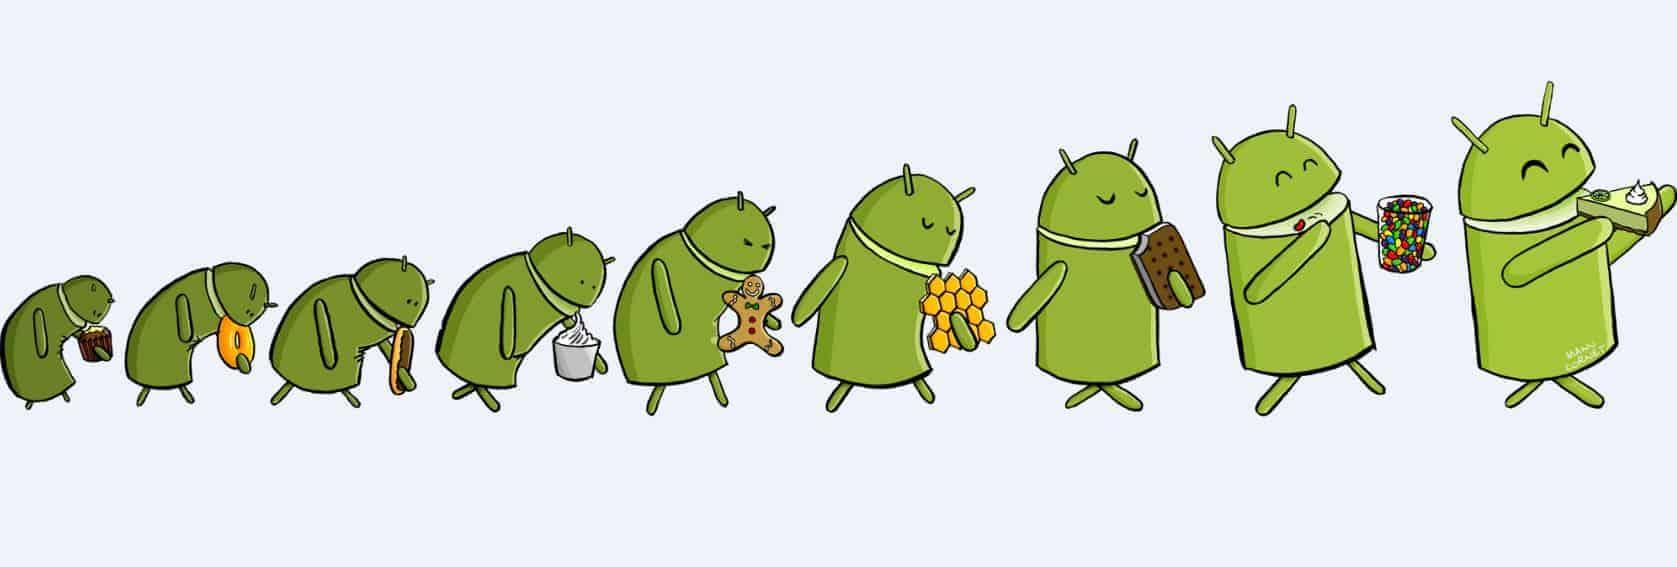 manu-cornet-bugdroid-cartoon-android-evolution-key-lime-pie